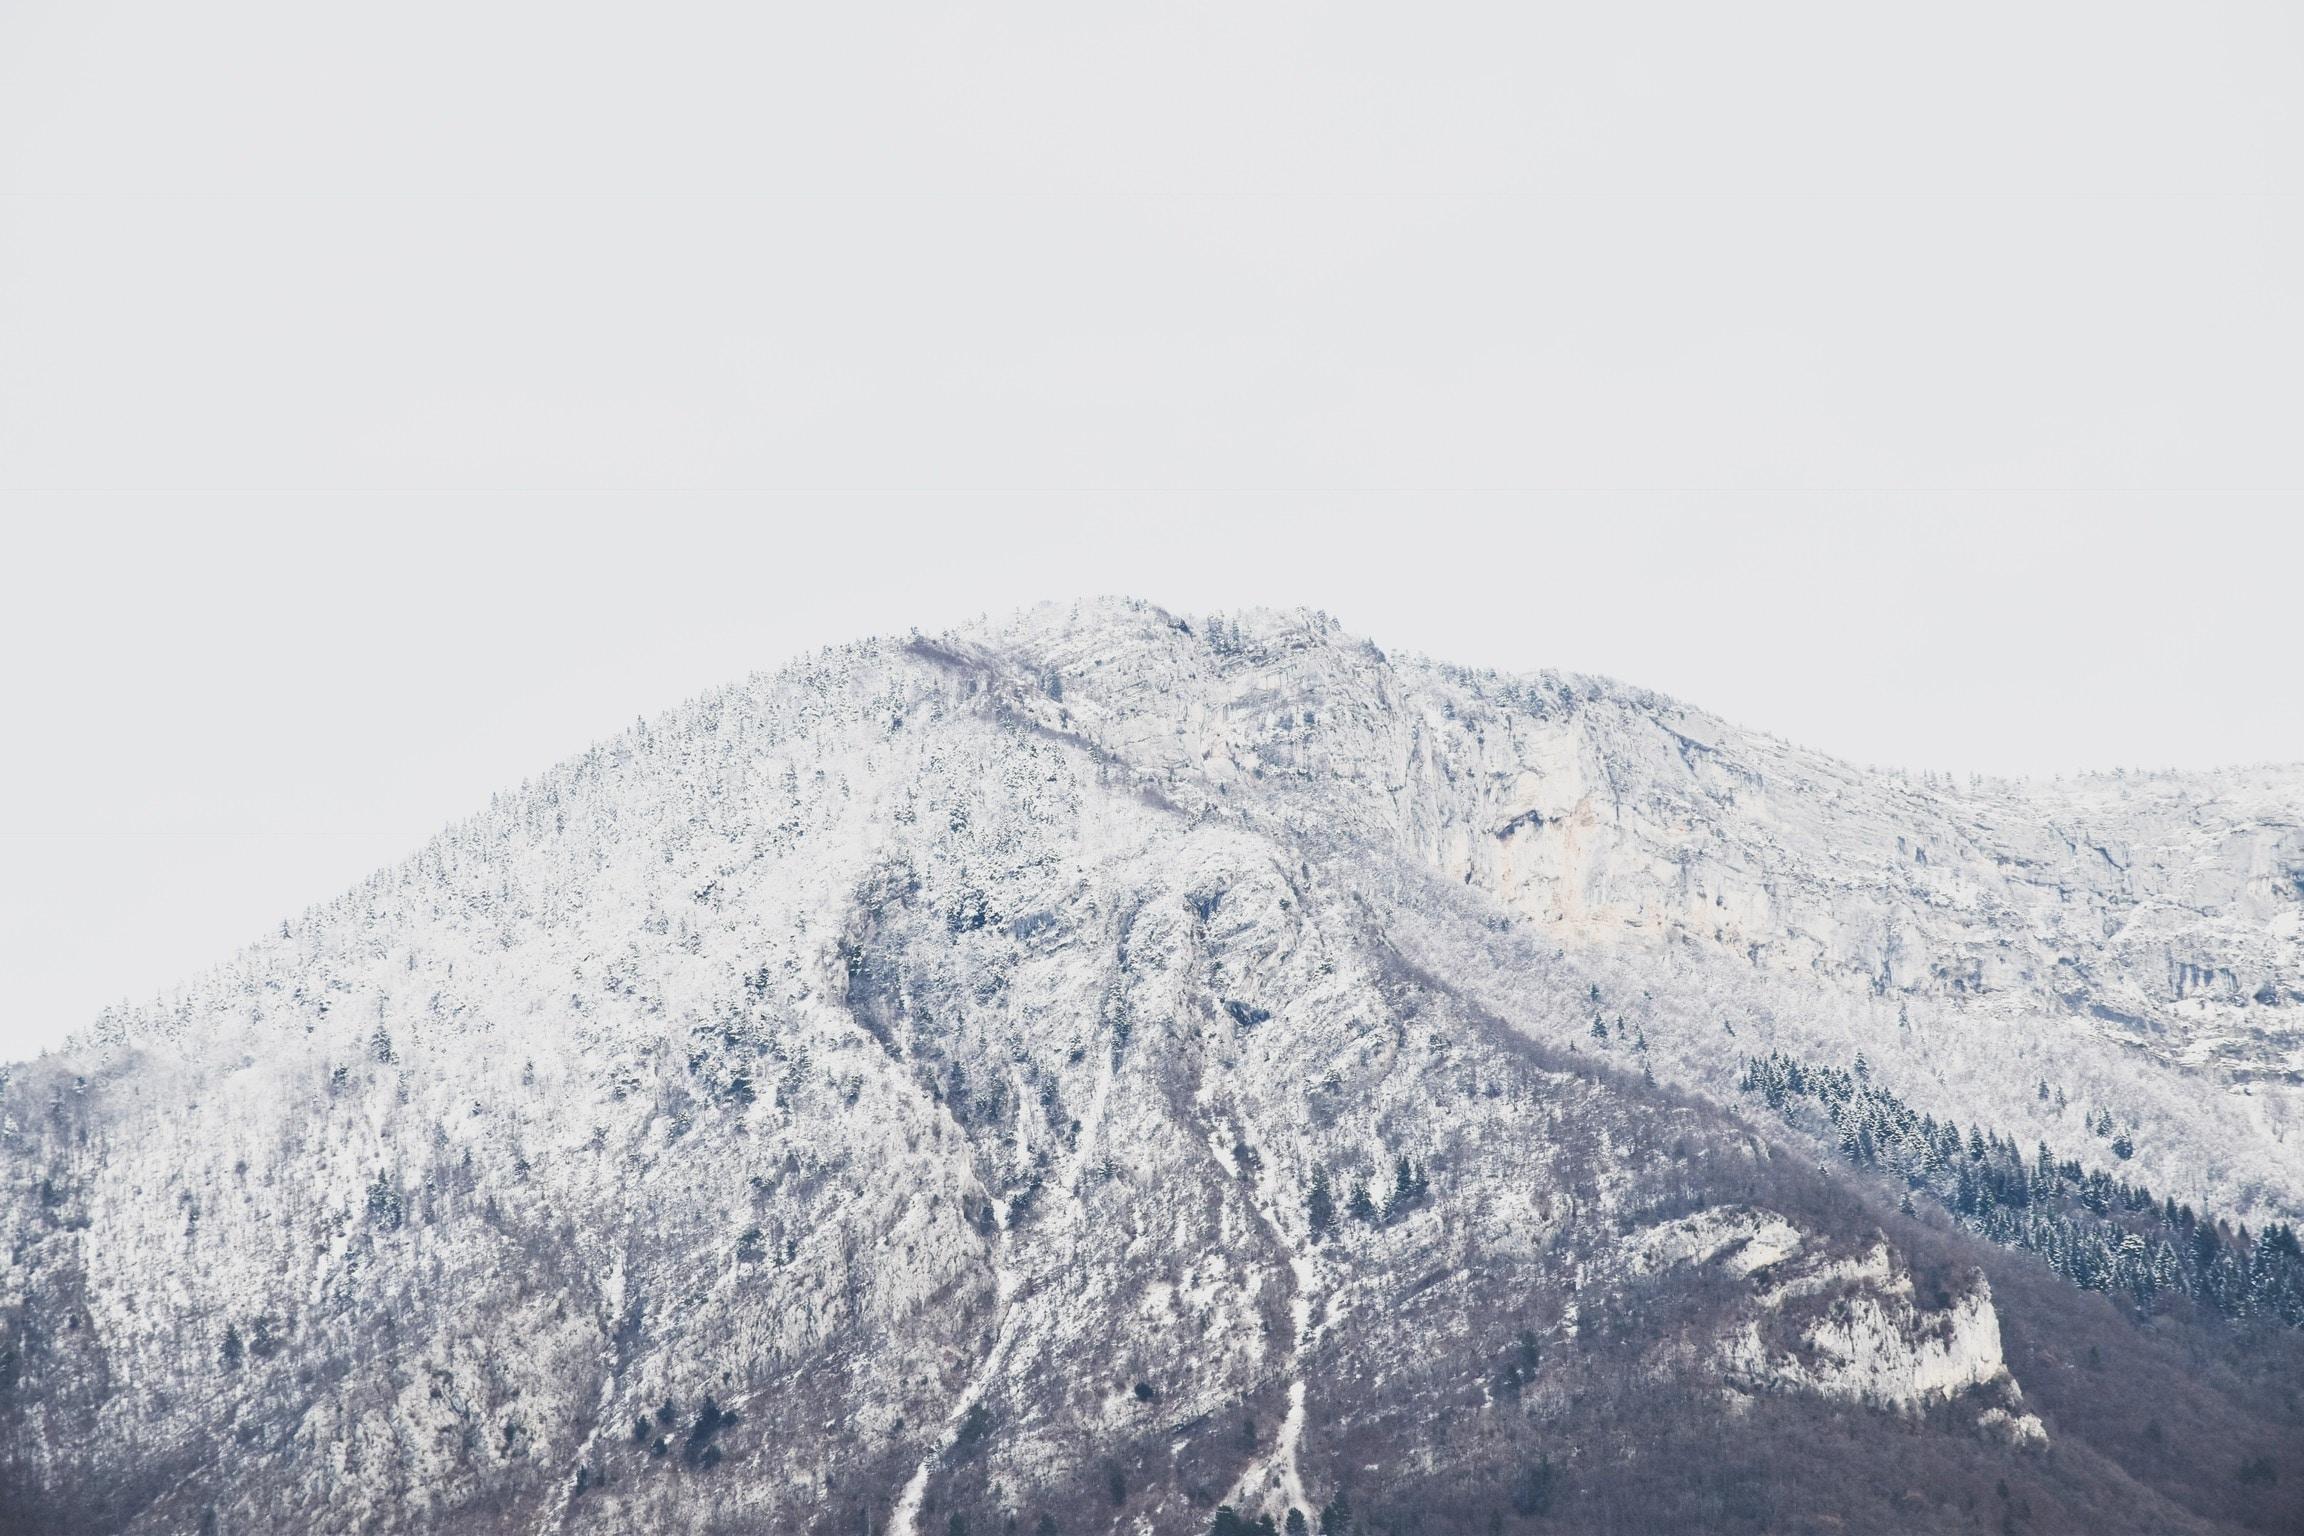 tundra mountain